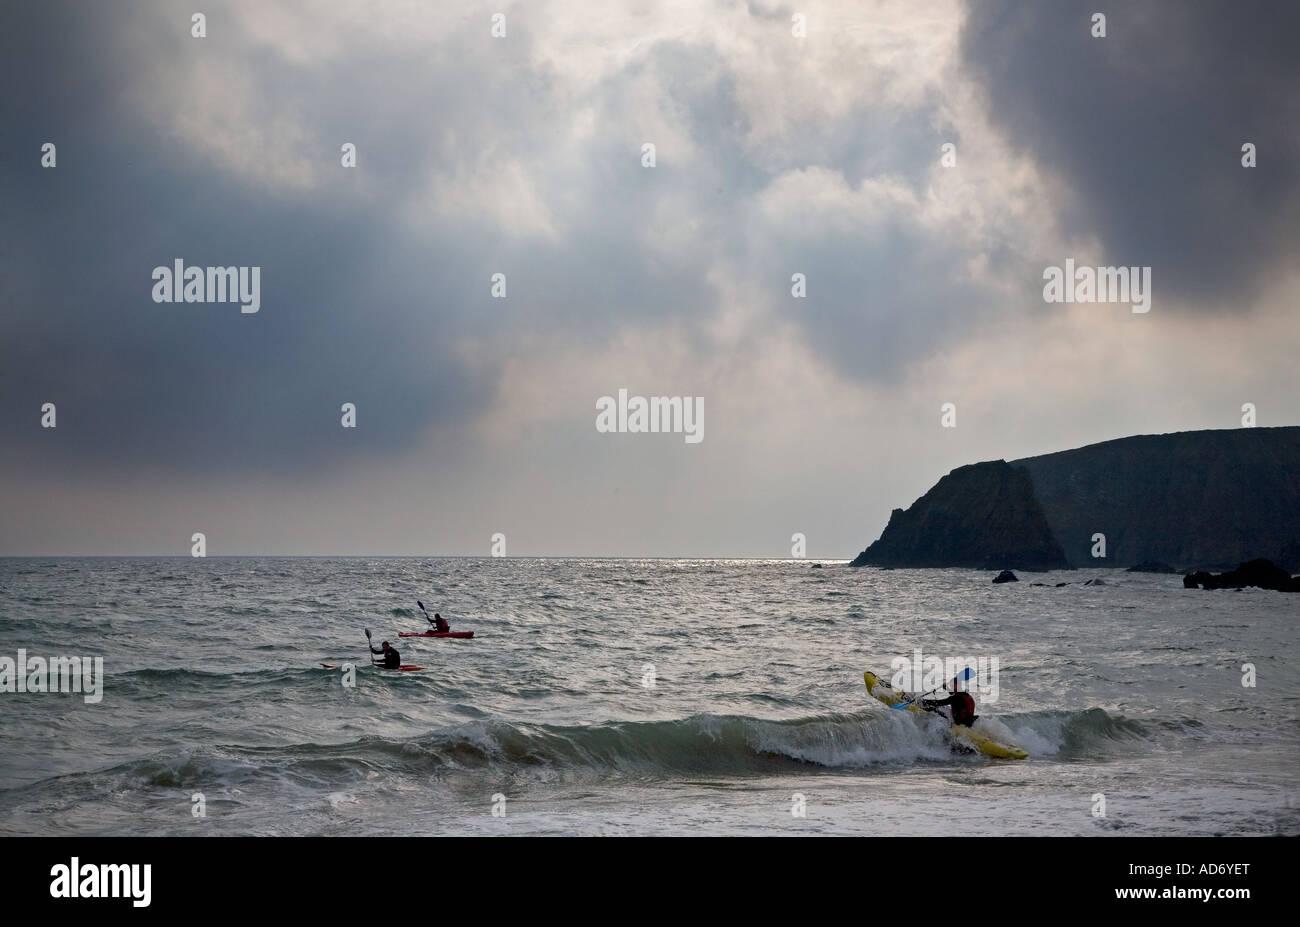 Kayaking at Kilfarassy Cove Copper Coast County Waterford Ireland - Stock Image